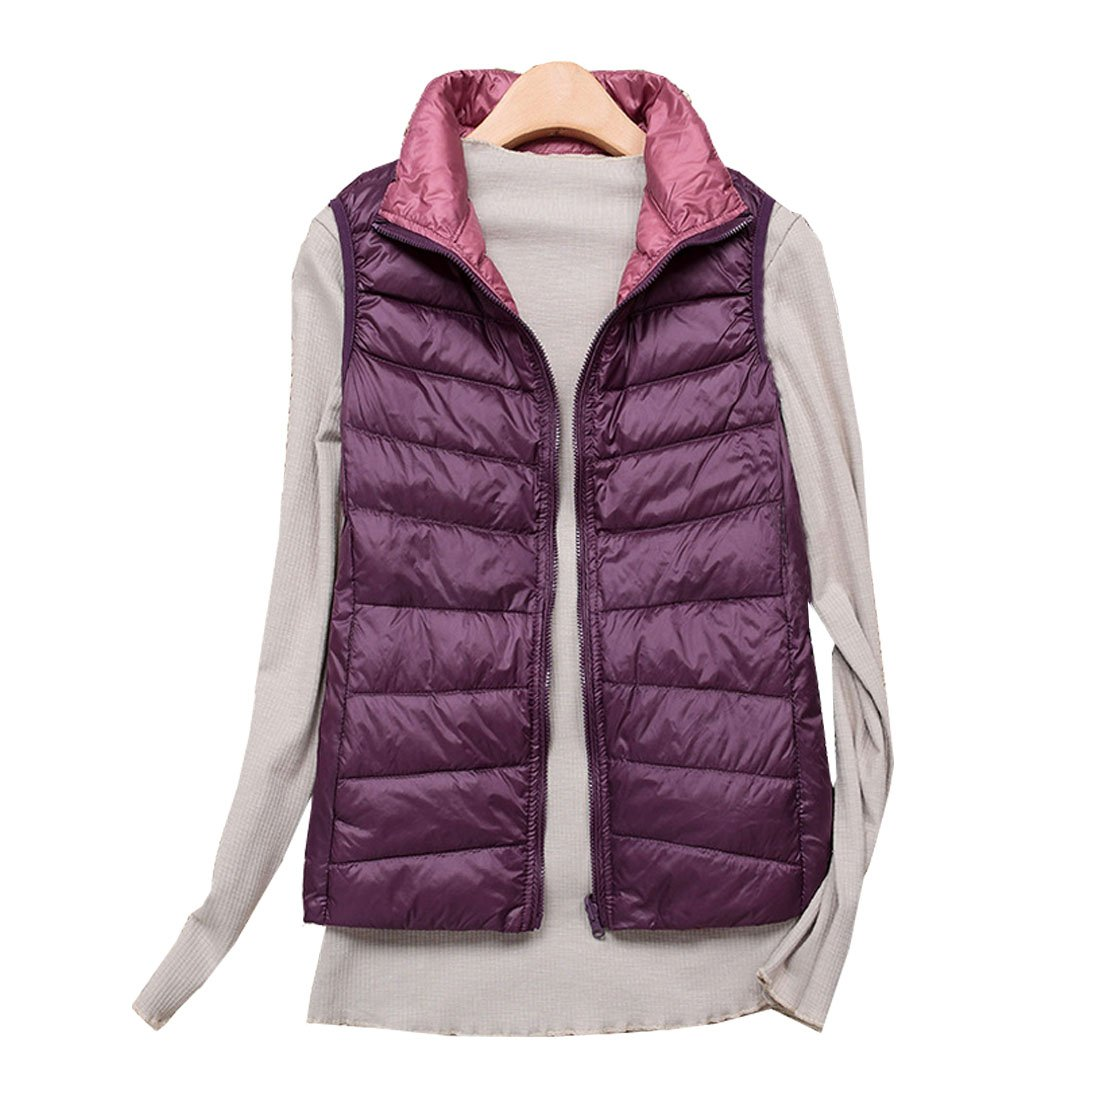 Hzcx Fashion Women's Ultra Lightweight Packable Quilted Reversable Down Vest